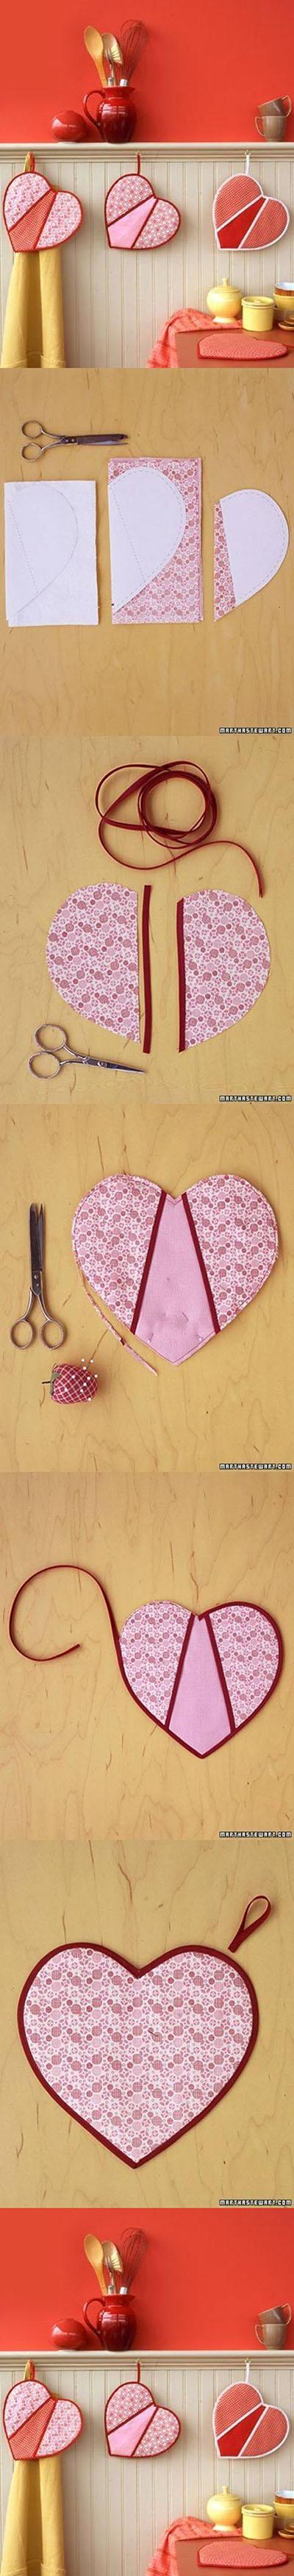 DIY-Heart-Shaped-Pot-Holders11